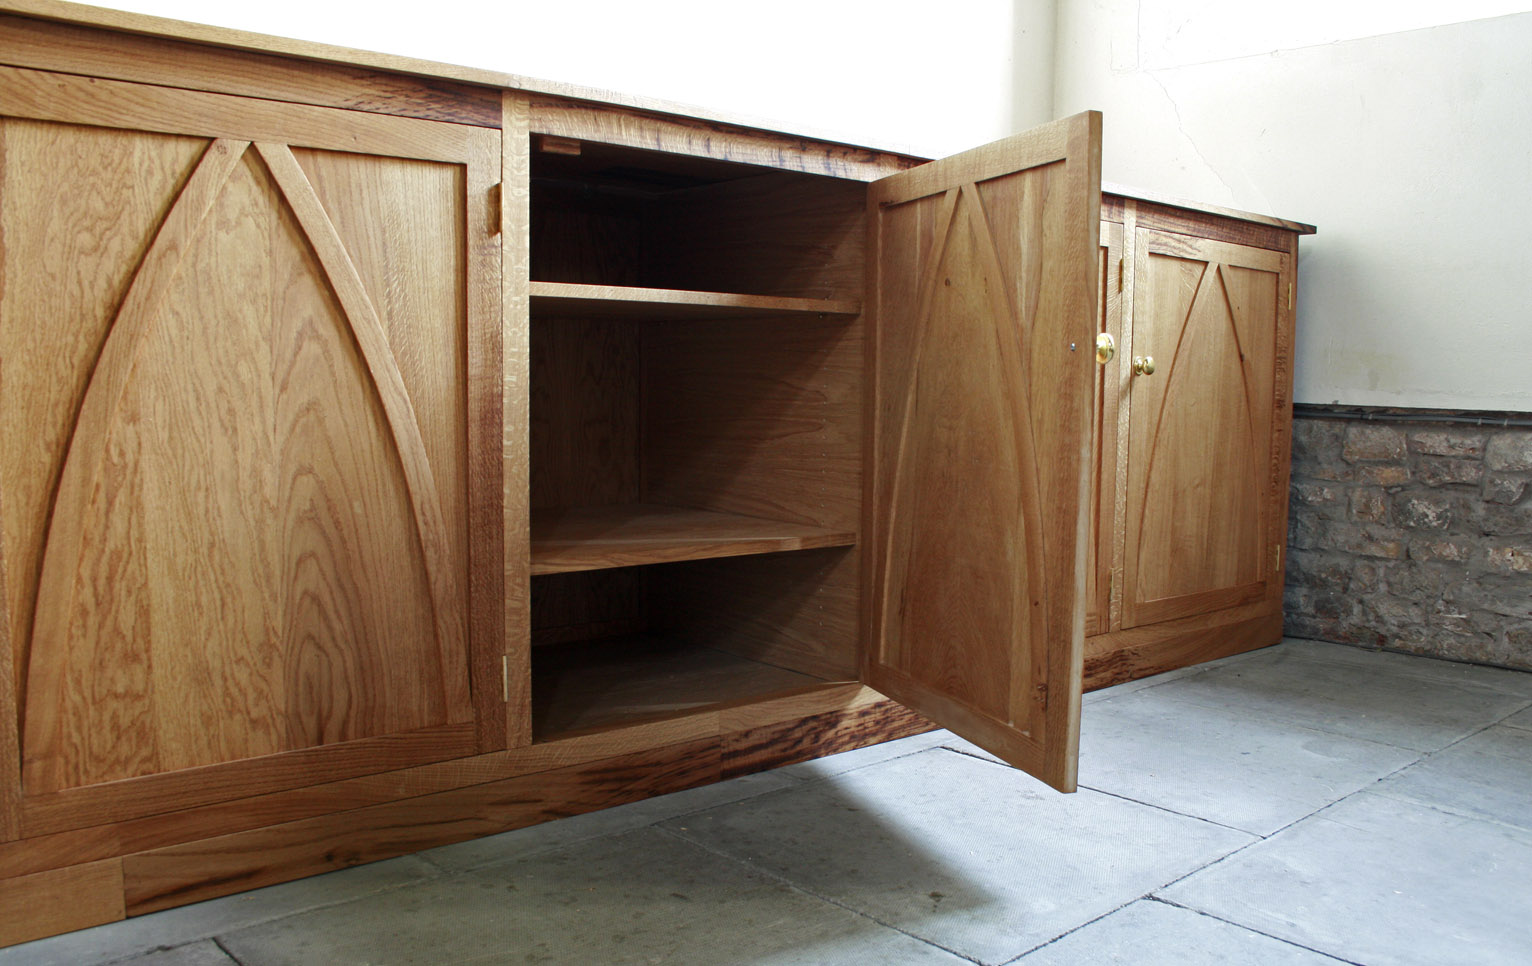 Fitted oak cabinet maker bristol, built in wardrobe bristol